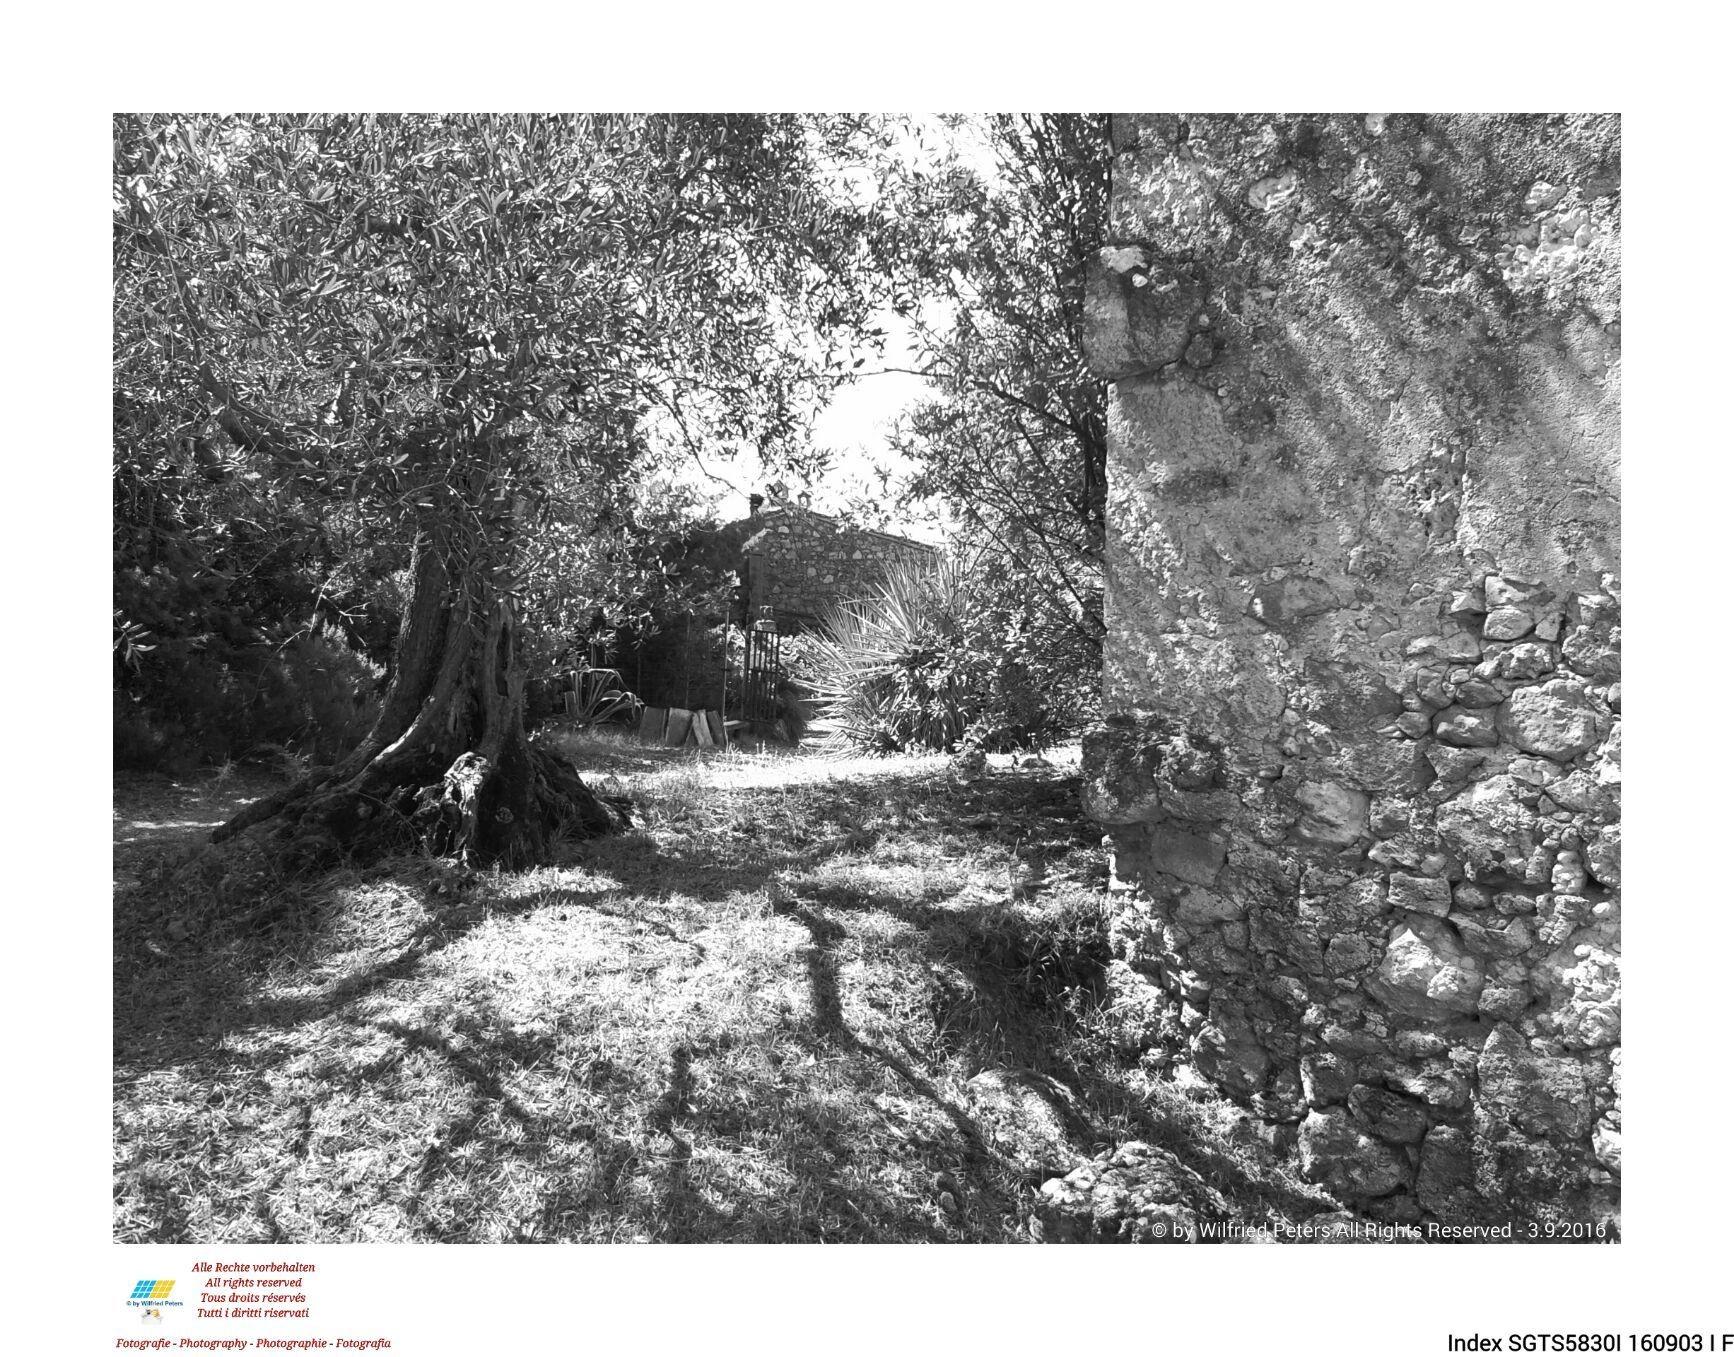 #Fotografie #Photography #Photographie #Fotografia #schwarzweiss #blackandwhite #noiretblanc #biancoenero #Italien #Italy #Italie #Italia